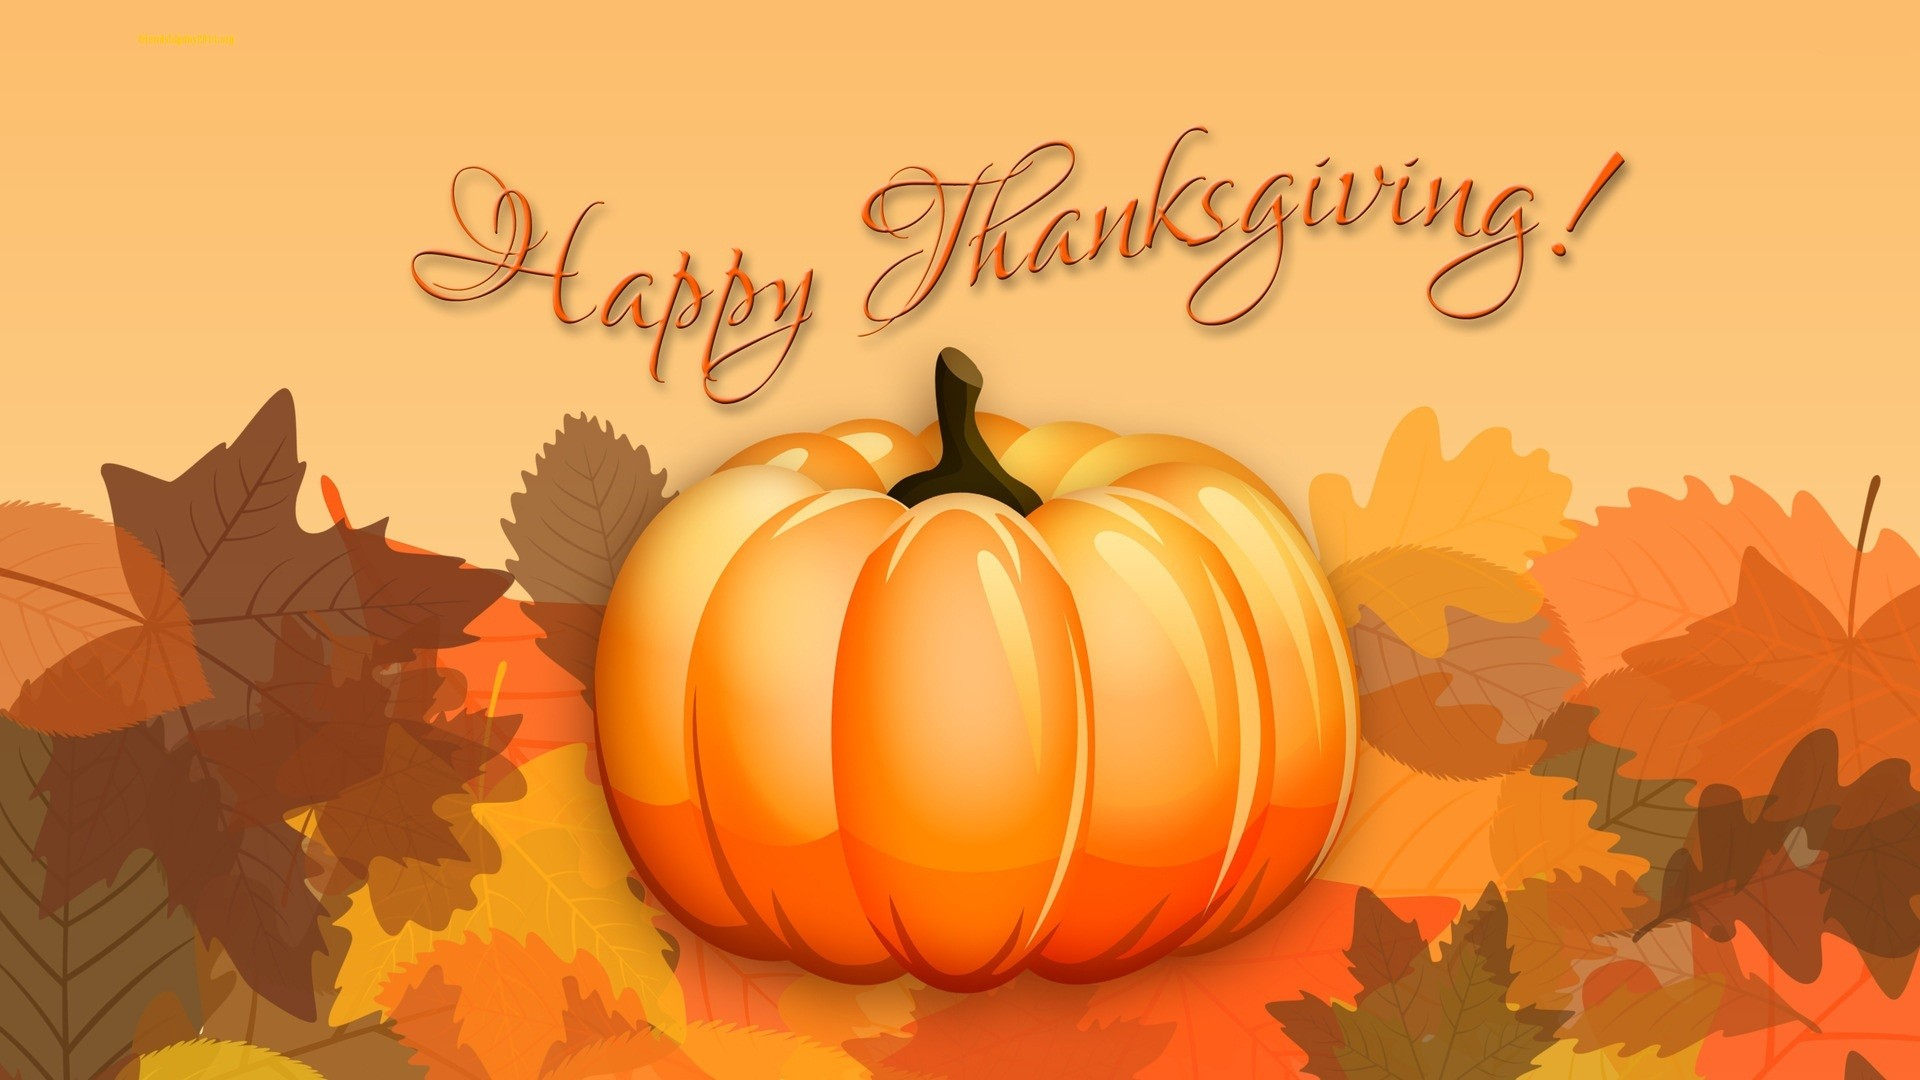 Happy Thanksgiving HD Wallpaper Free